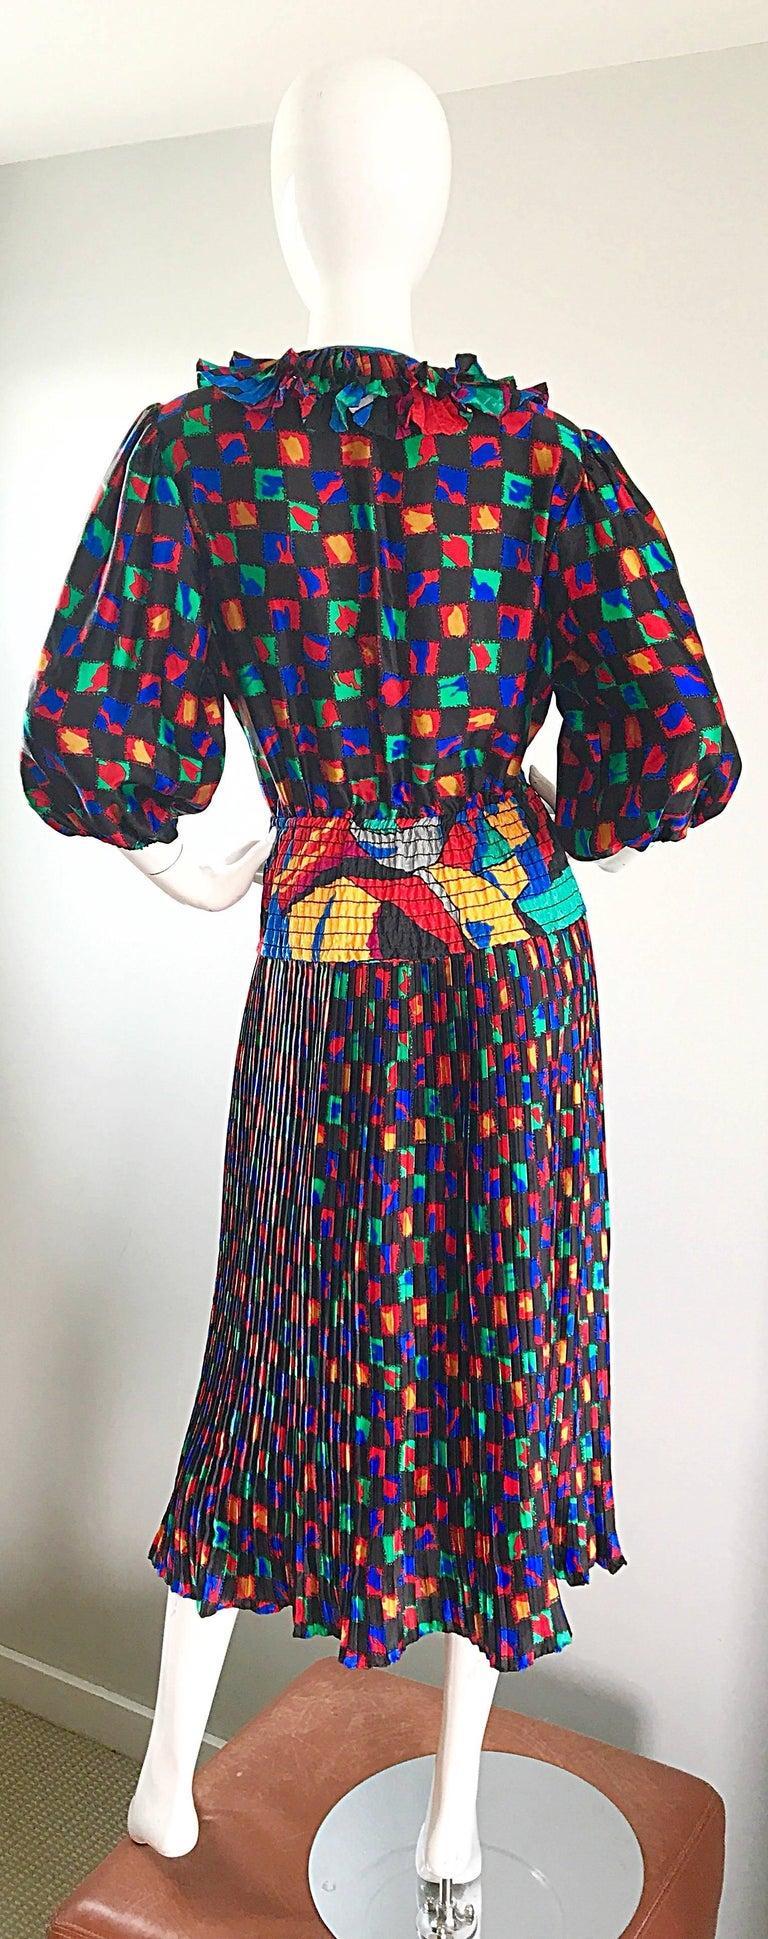 Diane Freis 1980s Colorful Mosaic Print Boho Ruffle Vintage 80s Midi Dress For Sale 4